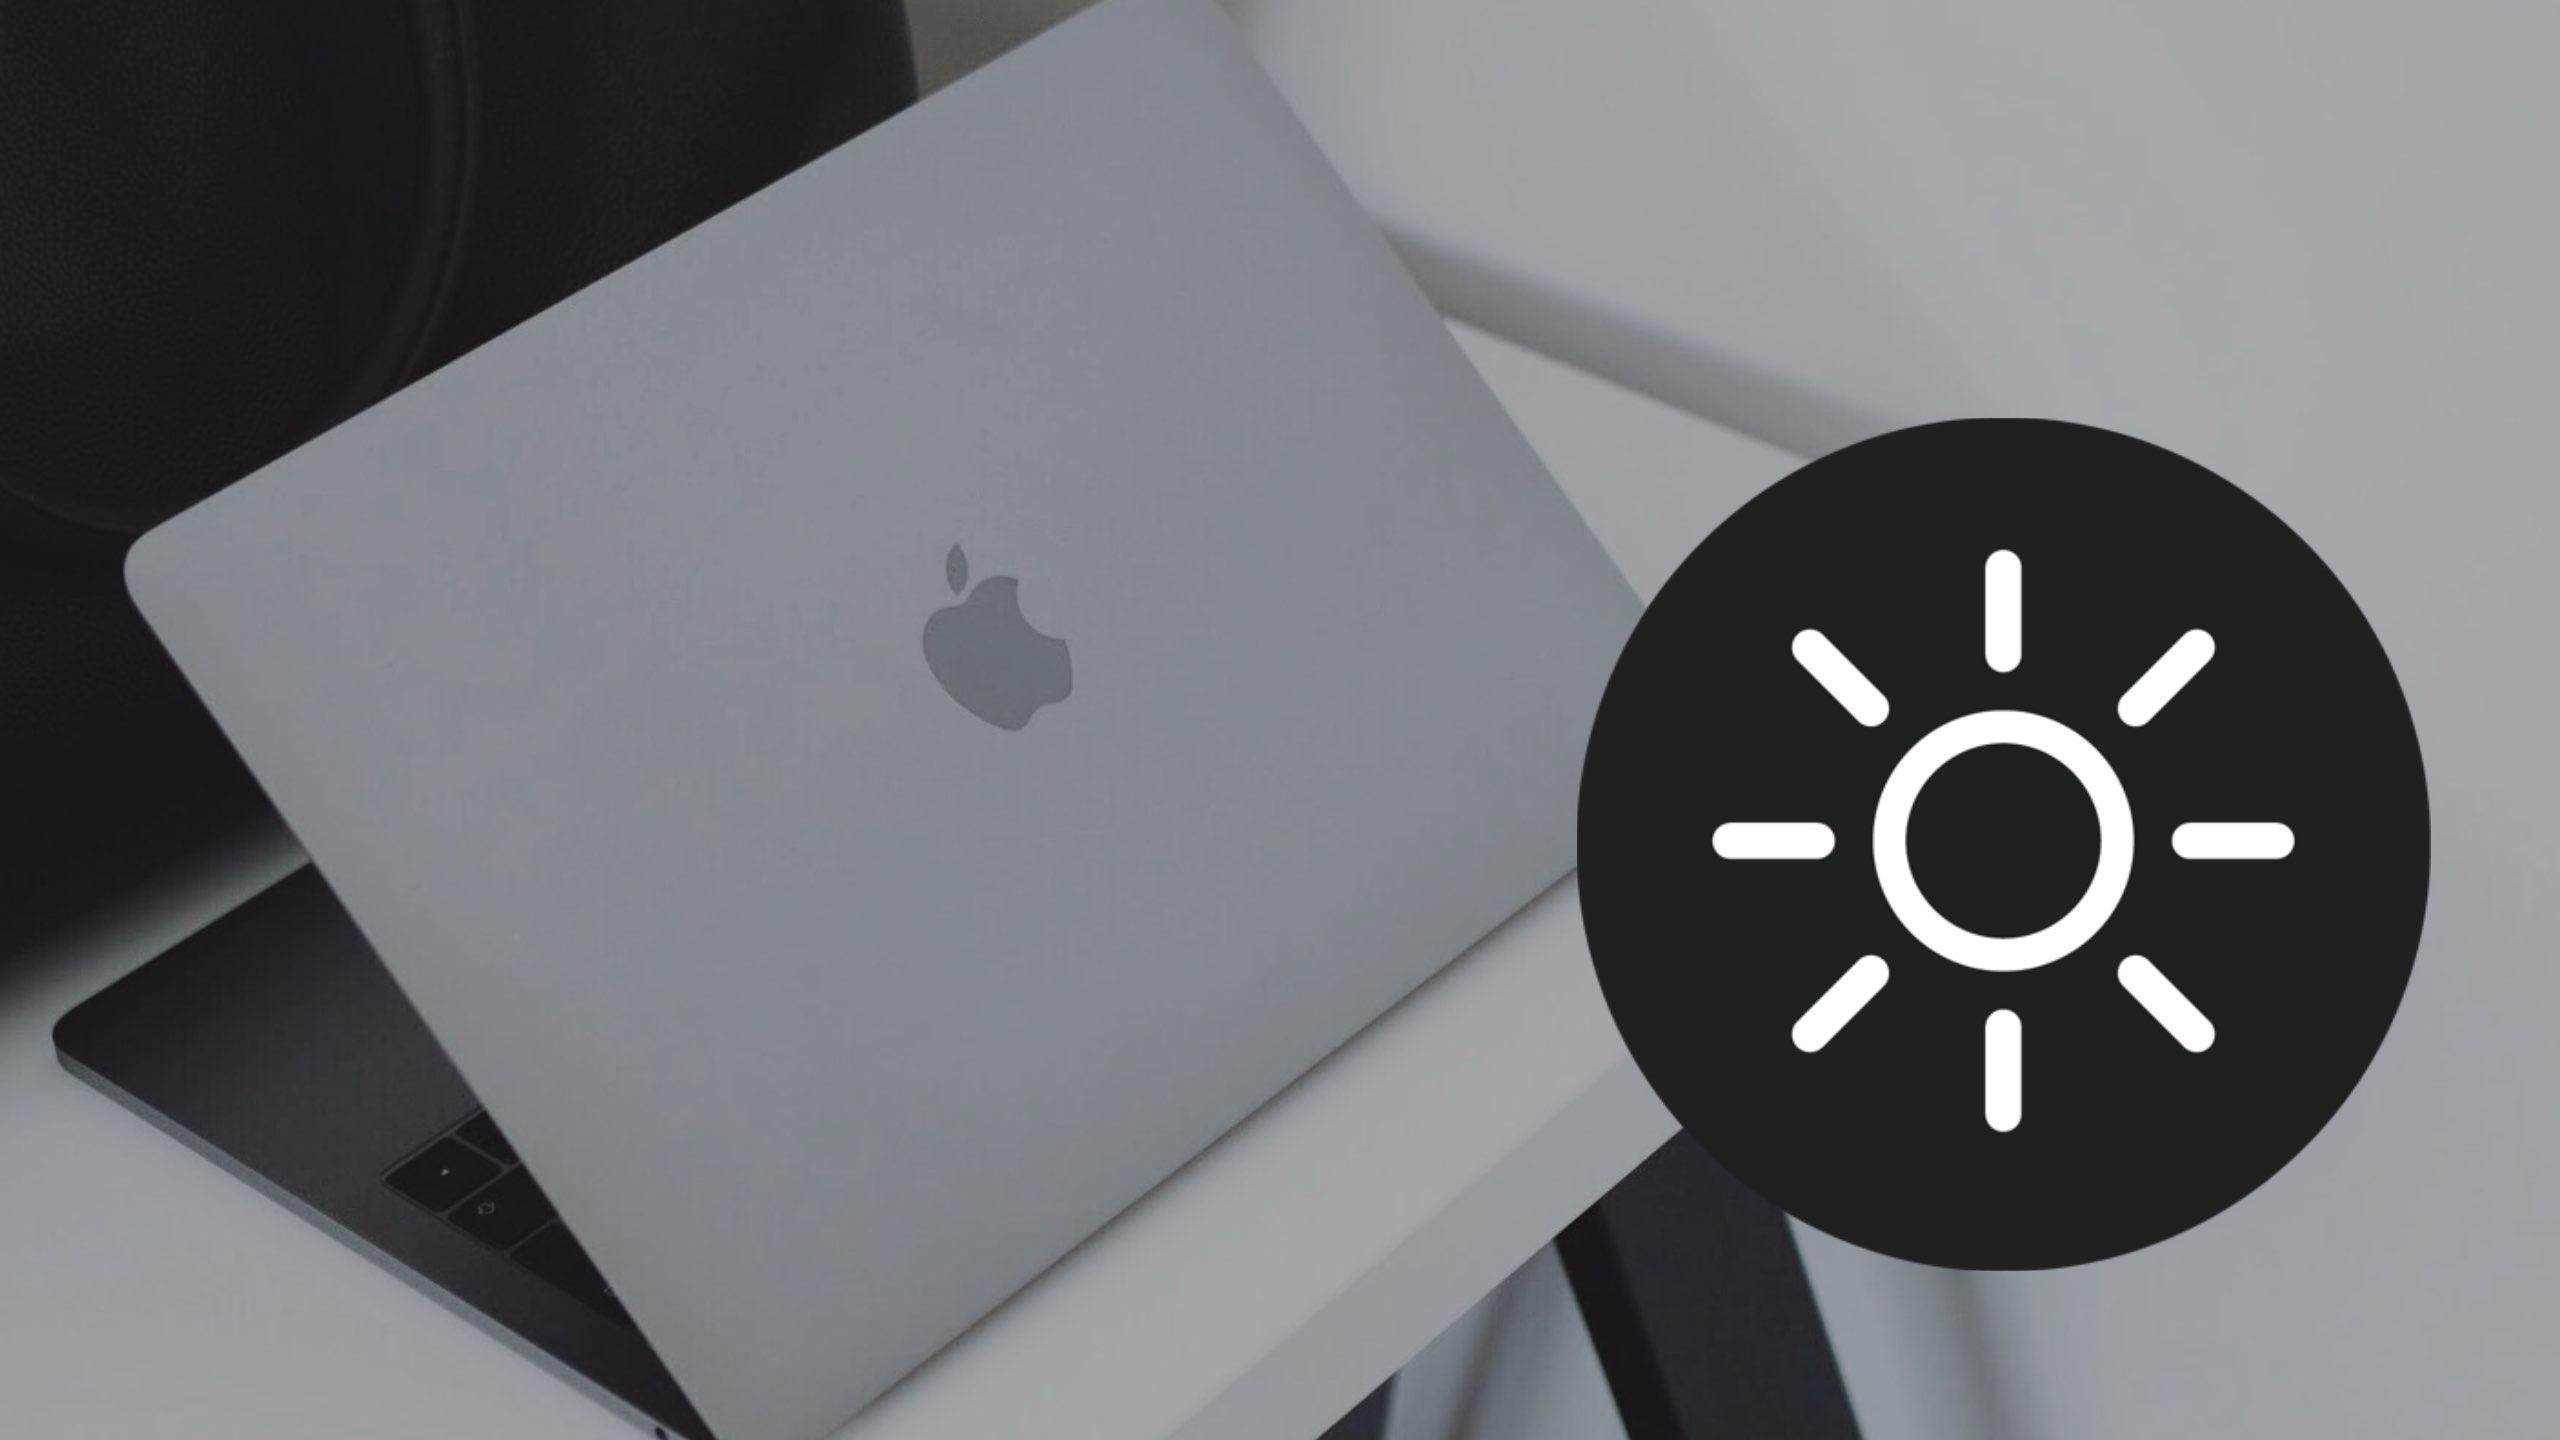 MacBookのおすすめ必須アプリ11選|Quick Shade